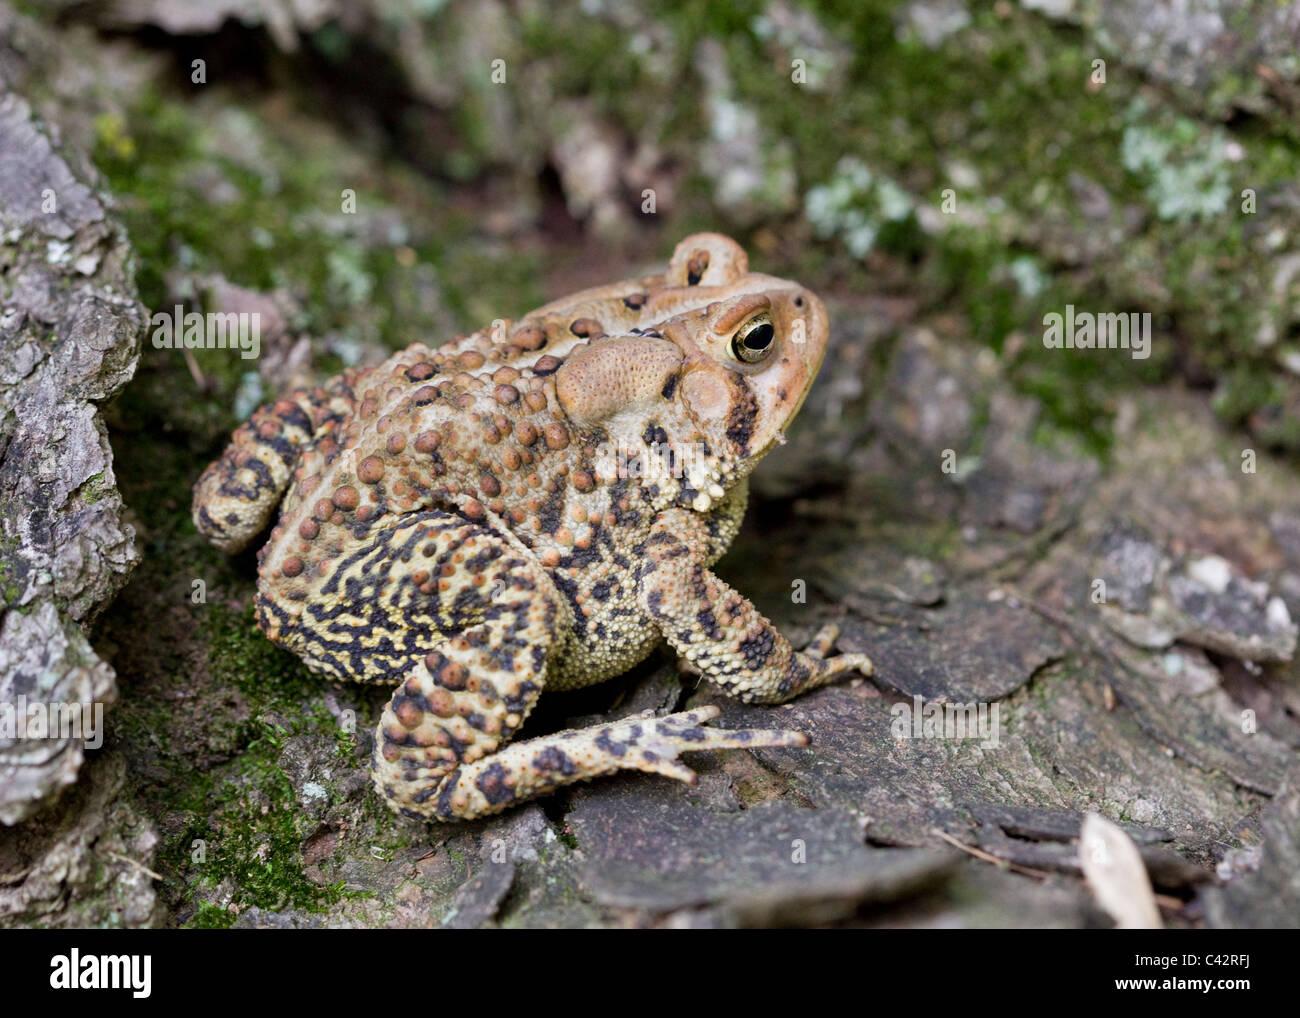 North American Fowler's toad (Anaxyrus fowleri) sitting on log - Virginia, USA Stock Photo